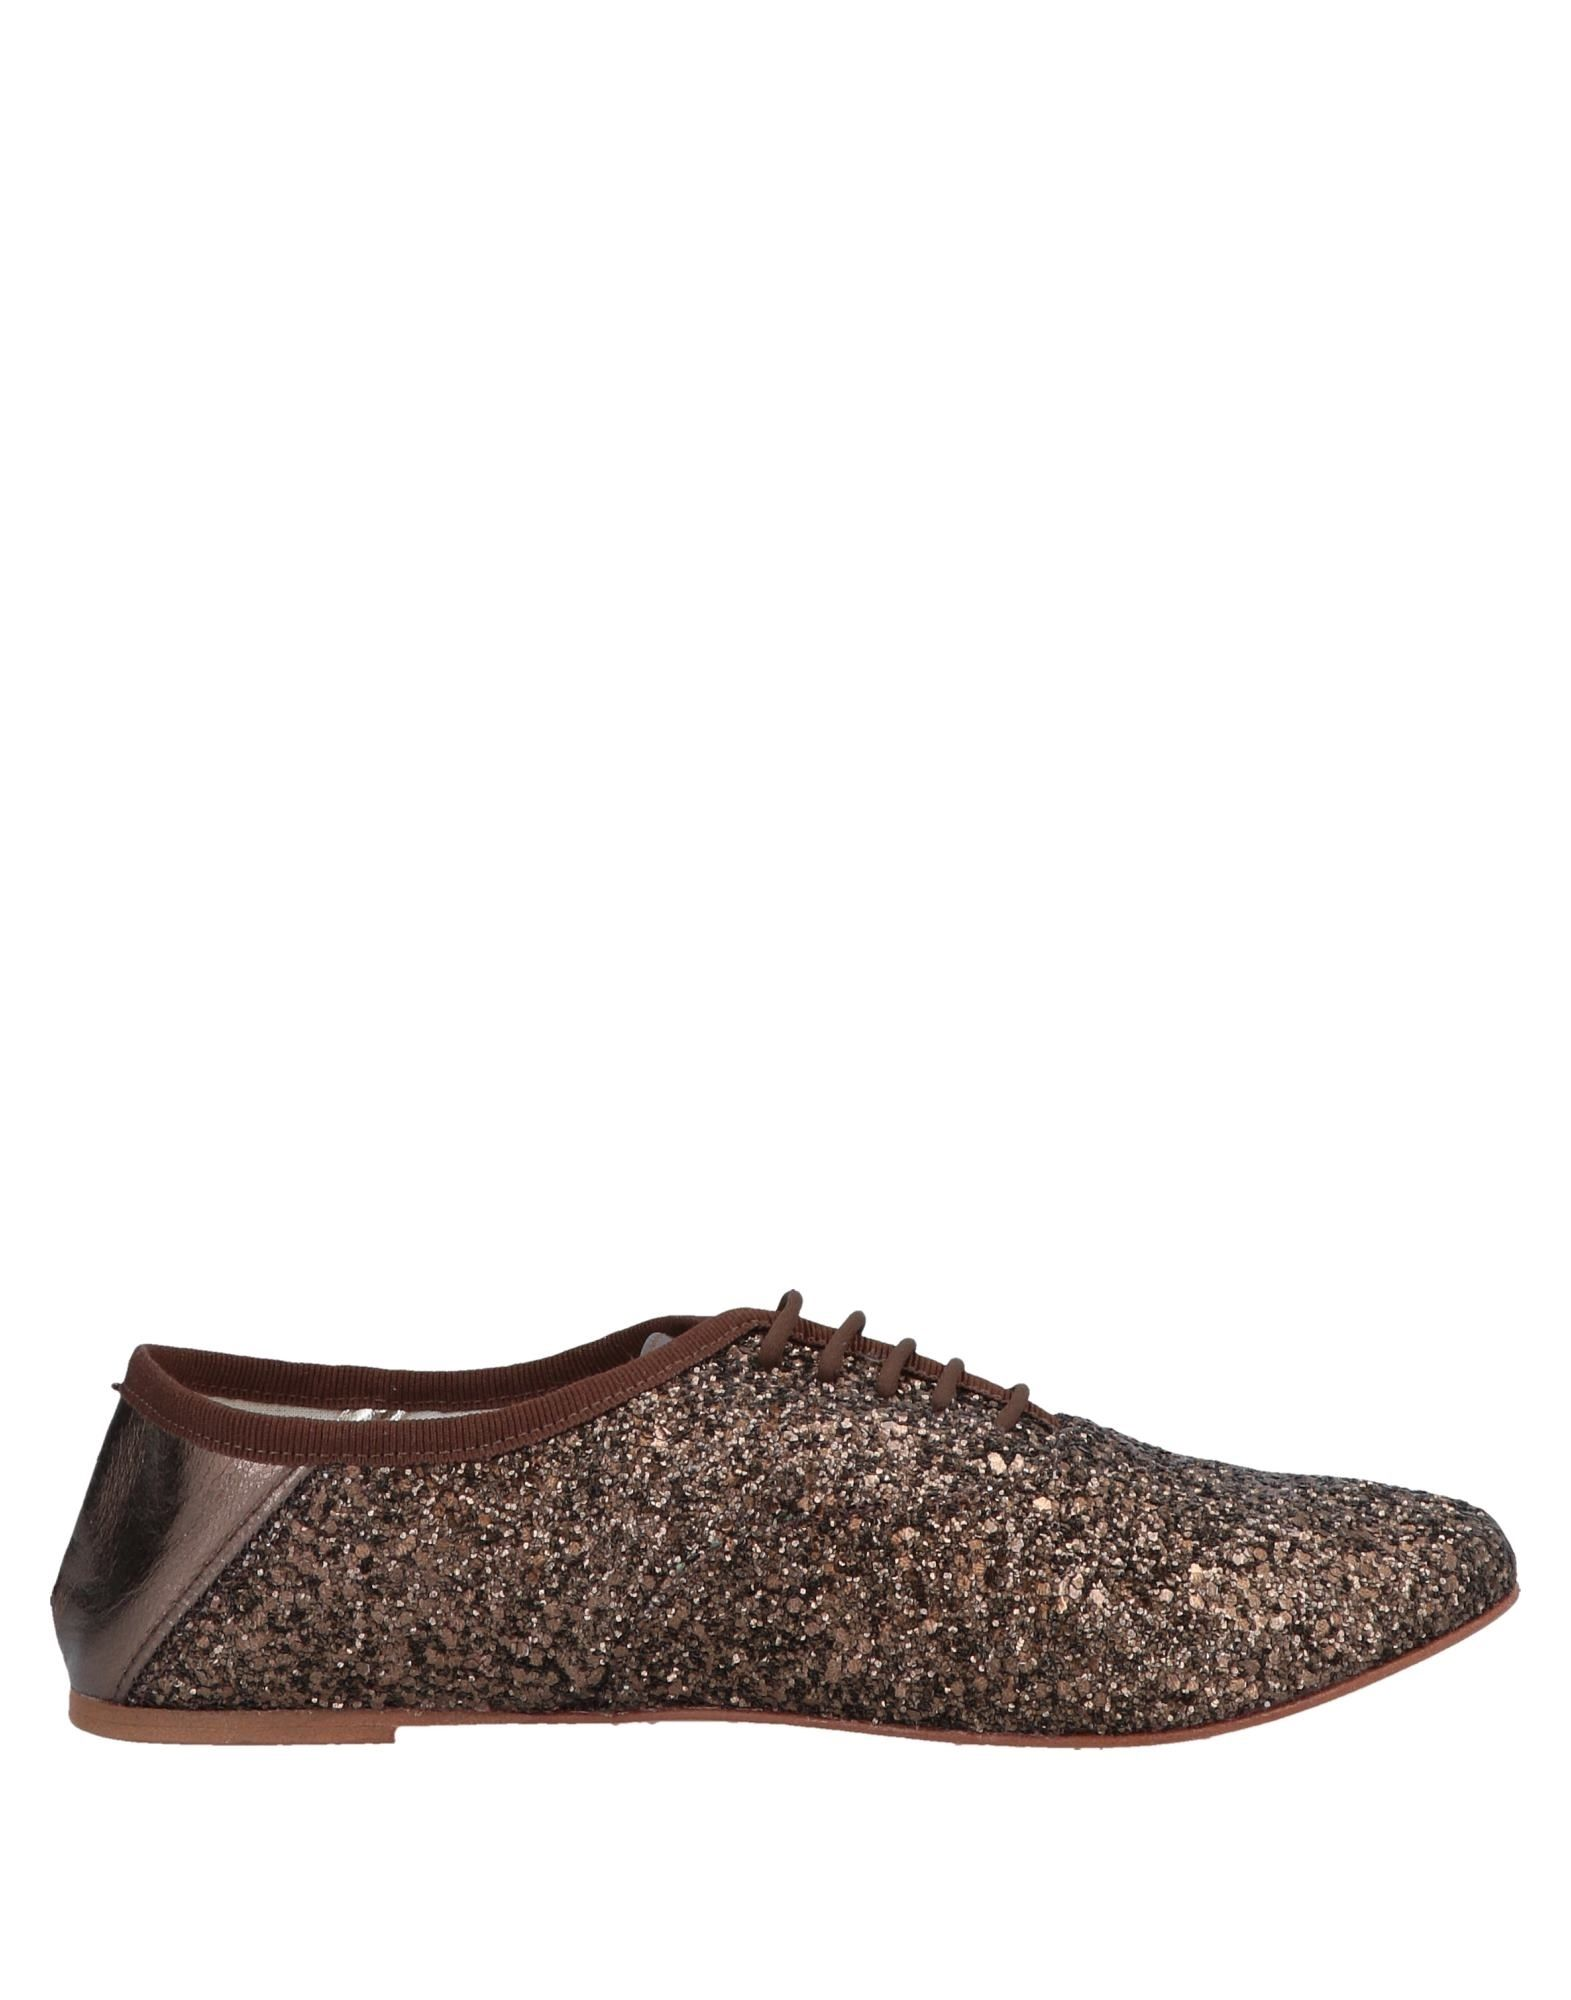 VIVERE CHIC by VERSILIA Обувь на шнурках versilia бежевые замшевые балетки с перфорацией от бренда versilia